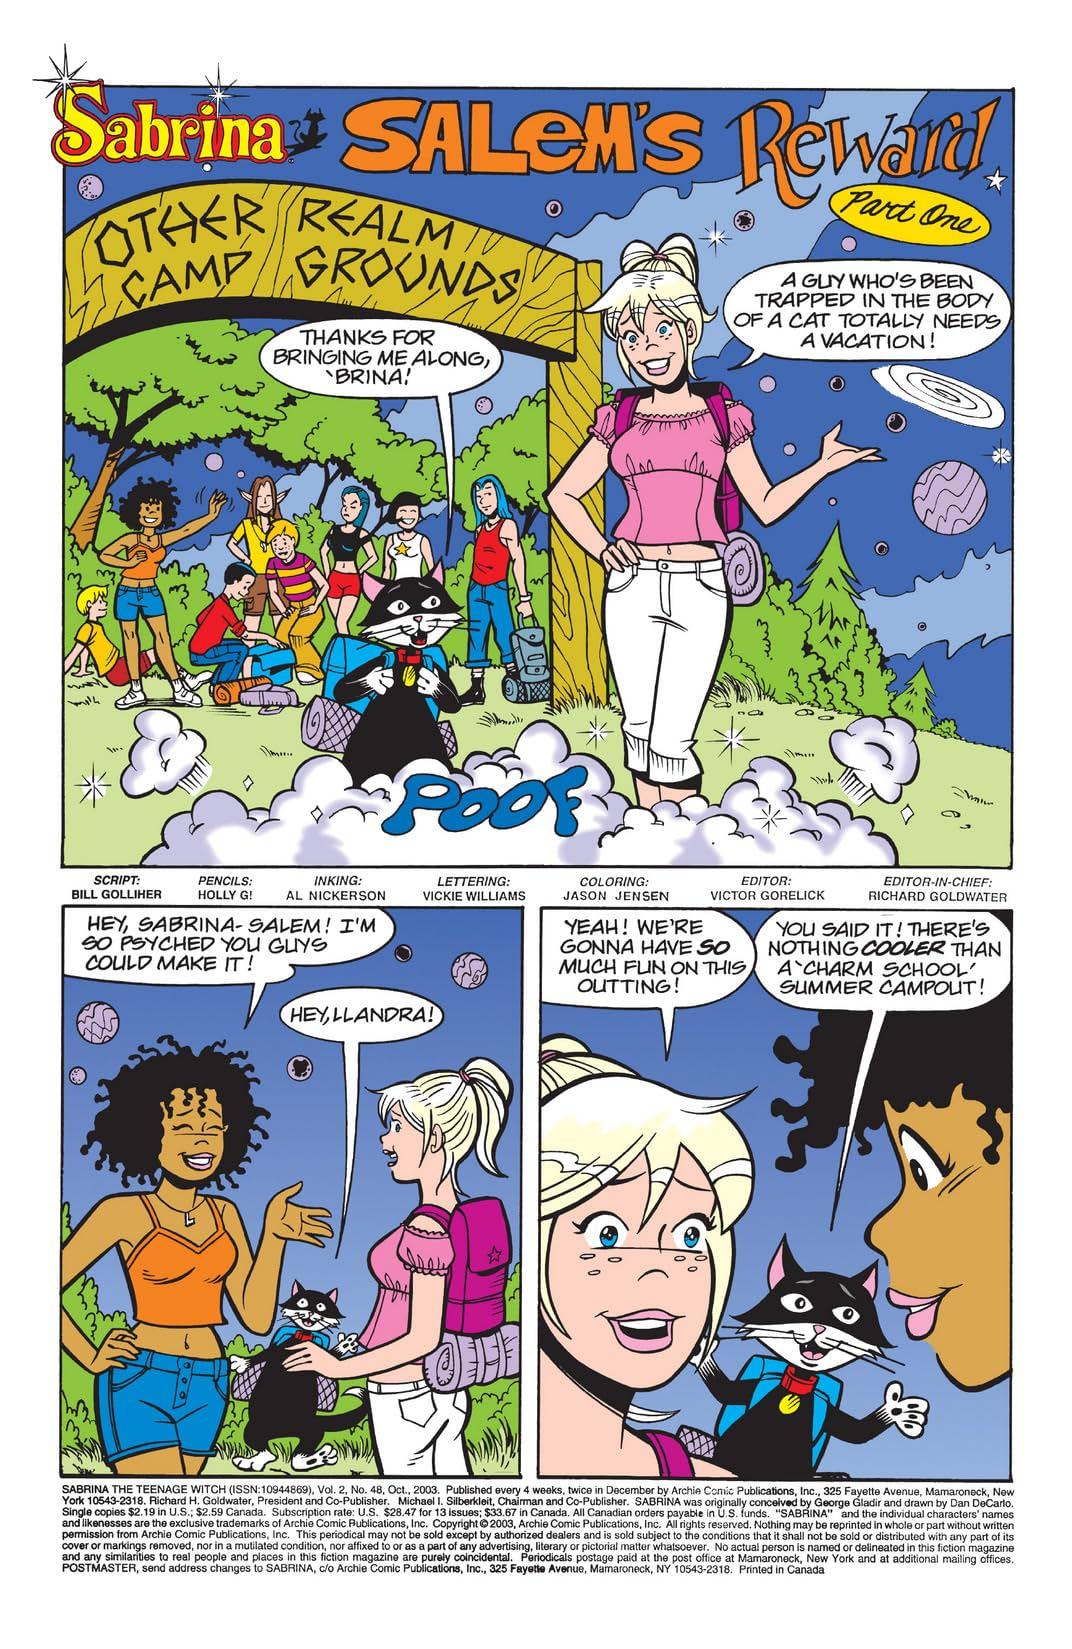 Sabrina the Teenage Witch #48